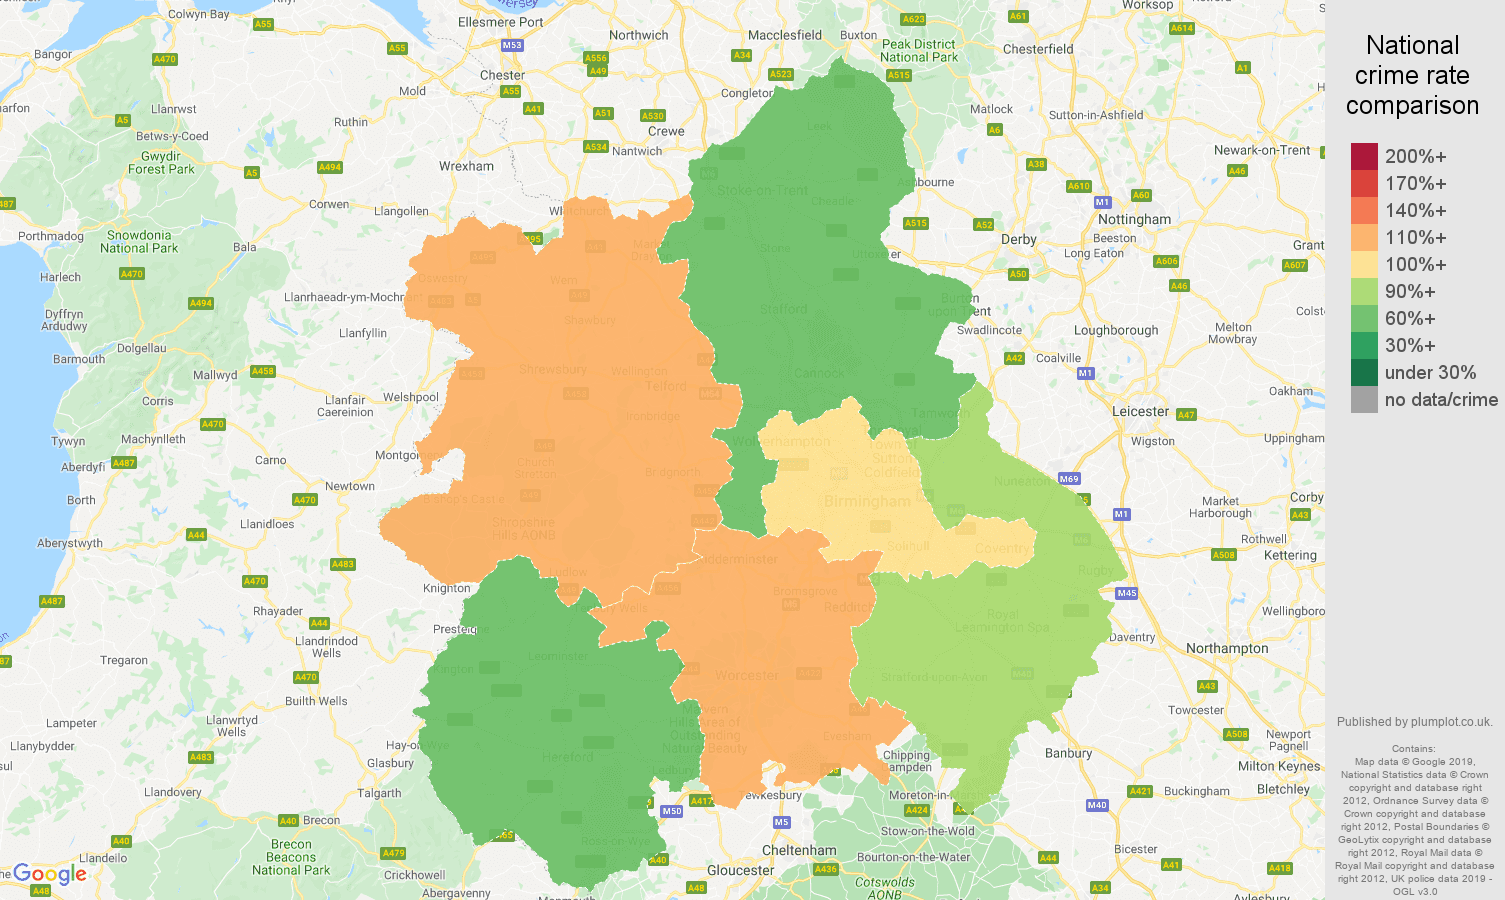 West Midlands shoplifting crime rate comparison map